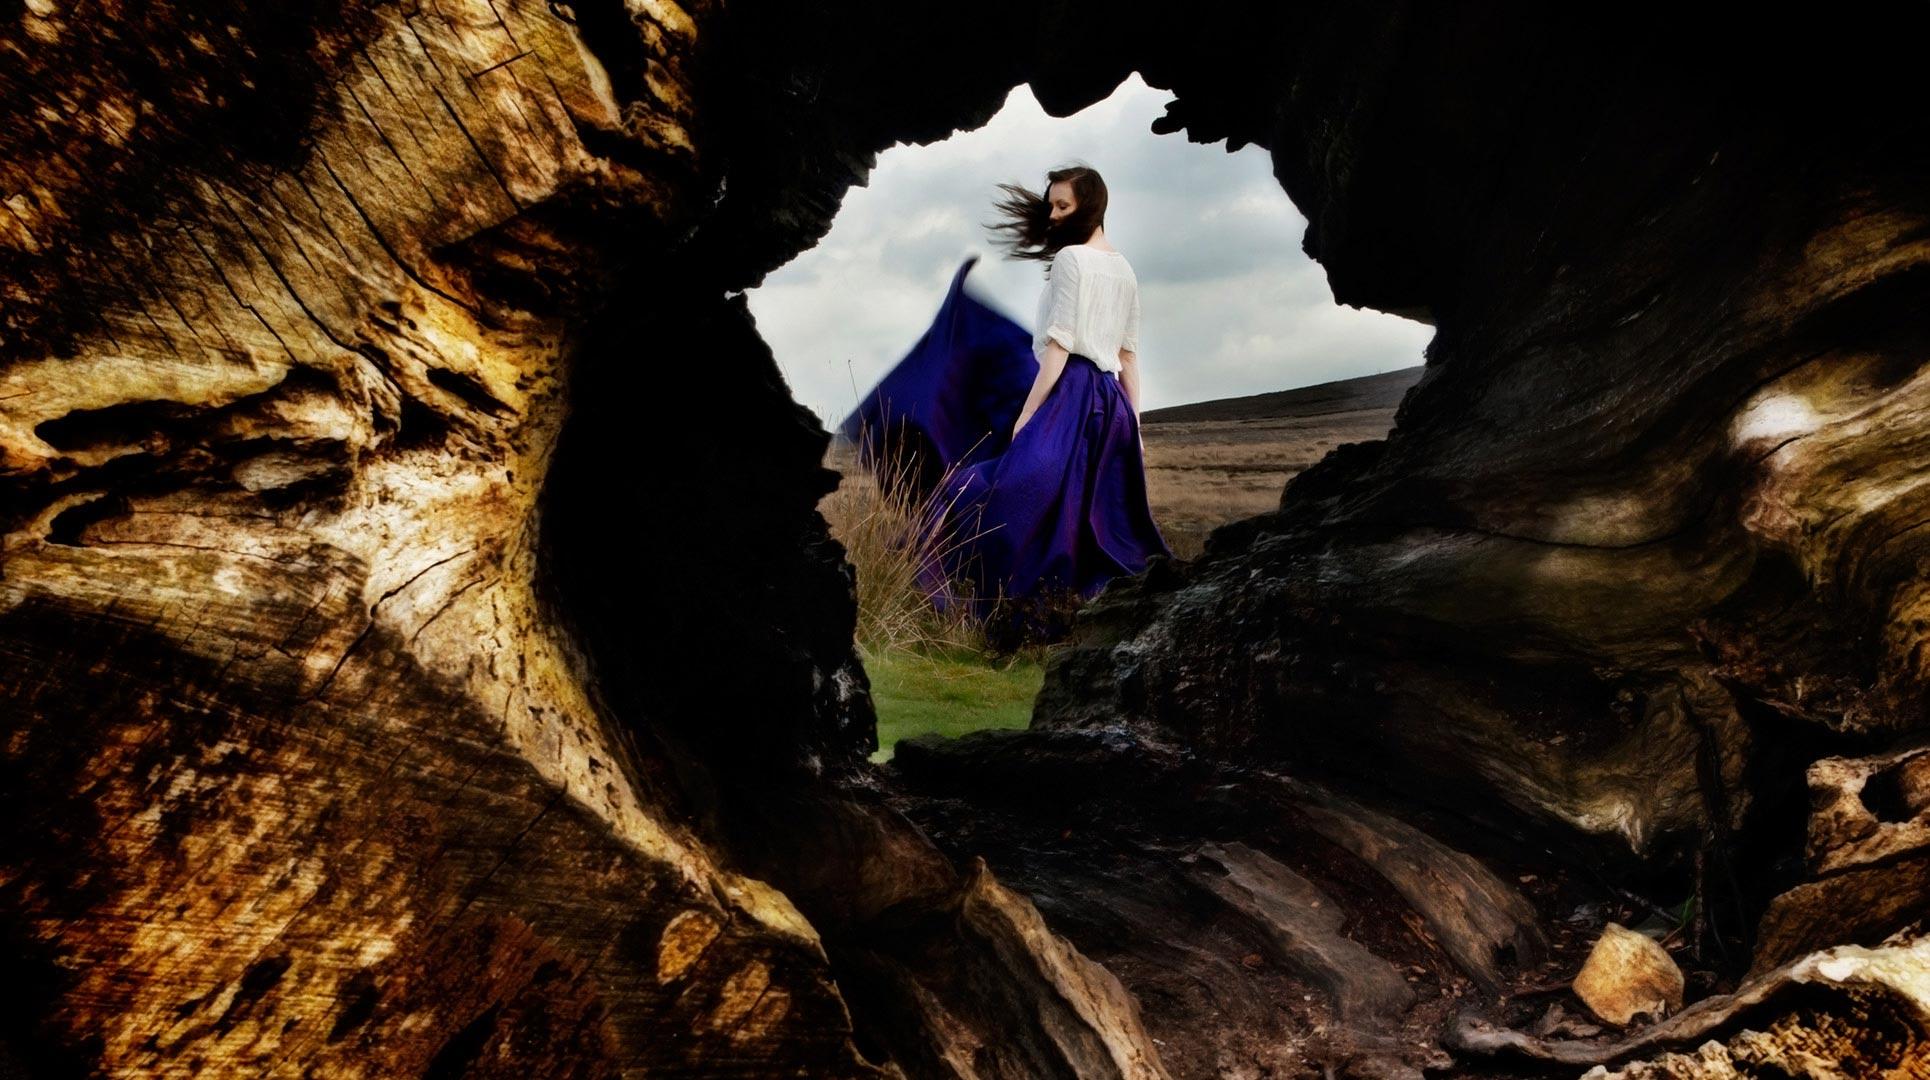 Nicola_Taylor_Art_Photography_Not_I_Not_I_1